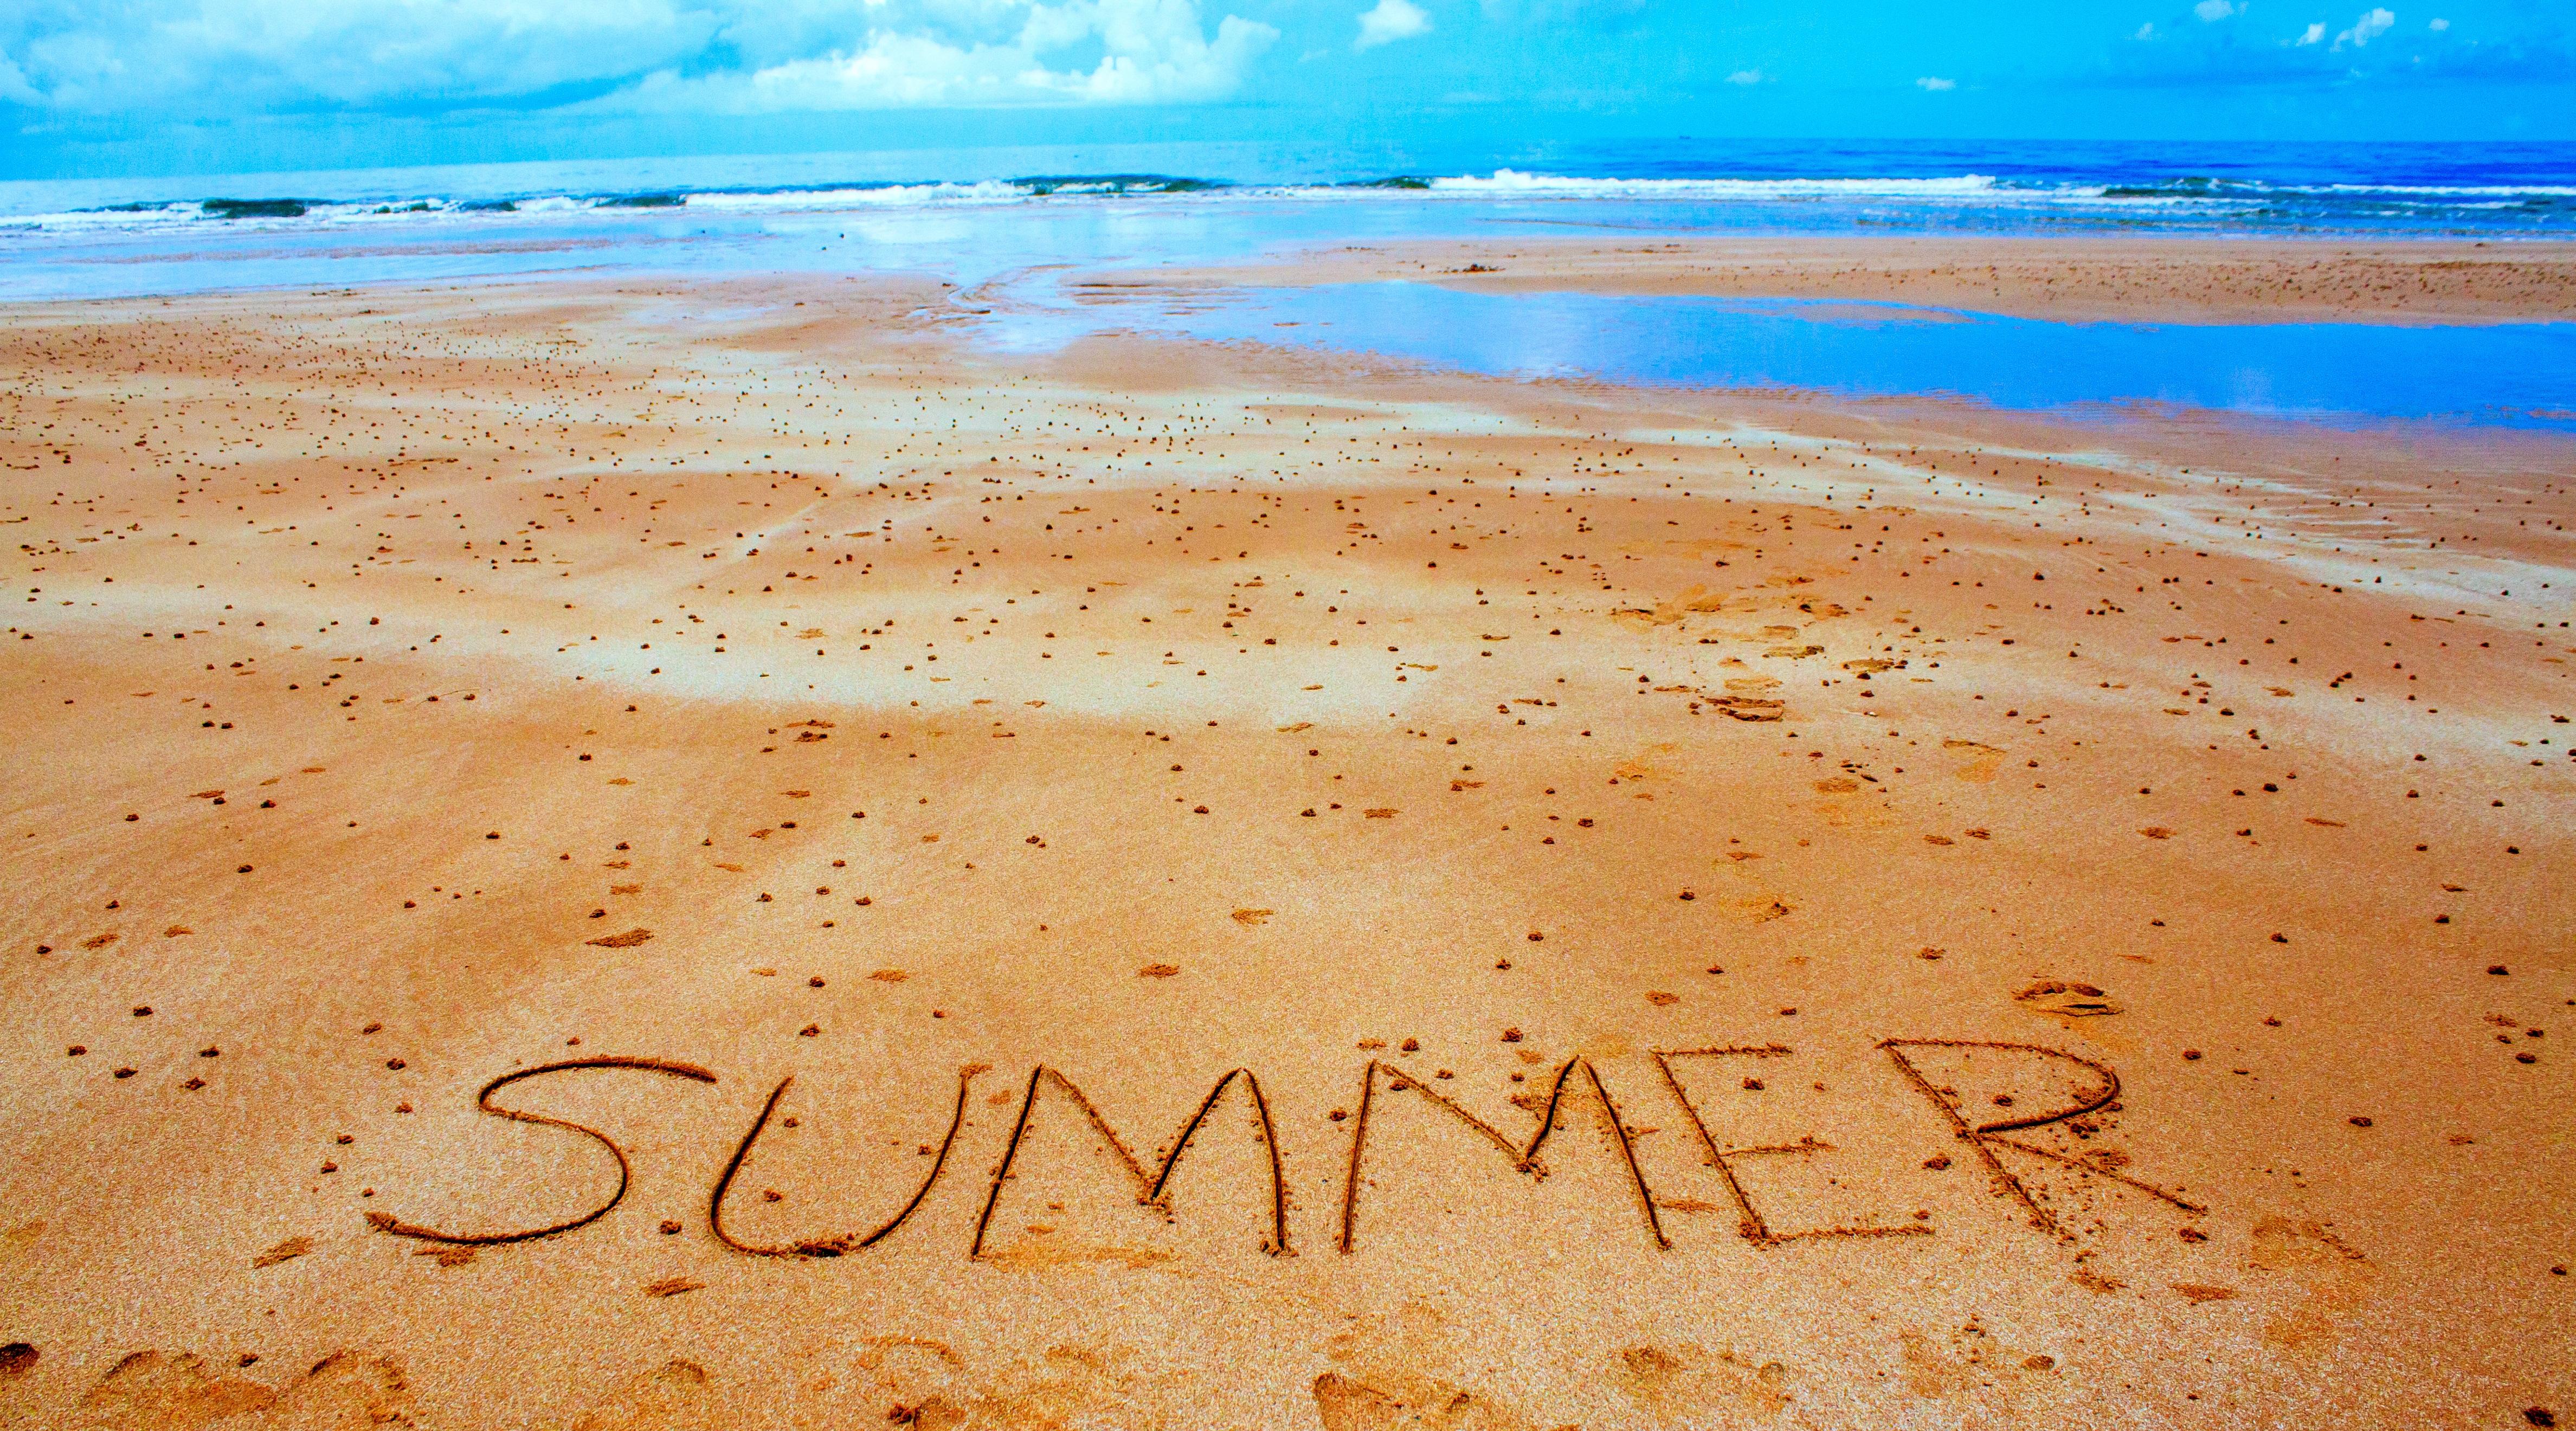 Summer Backgrounds on Wallpapers Vista